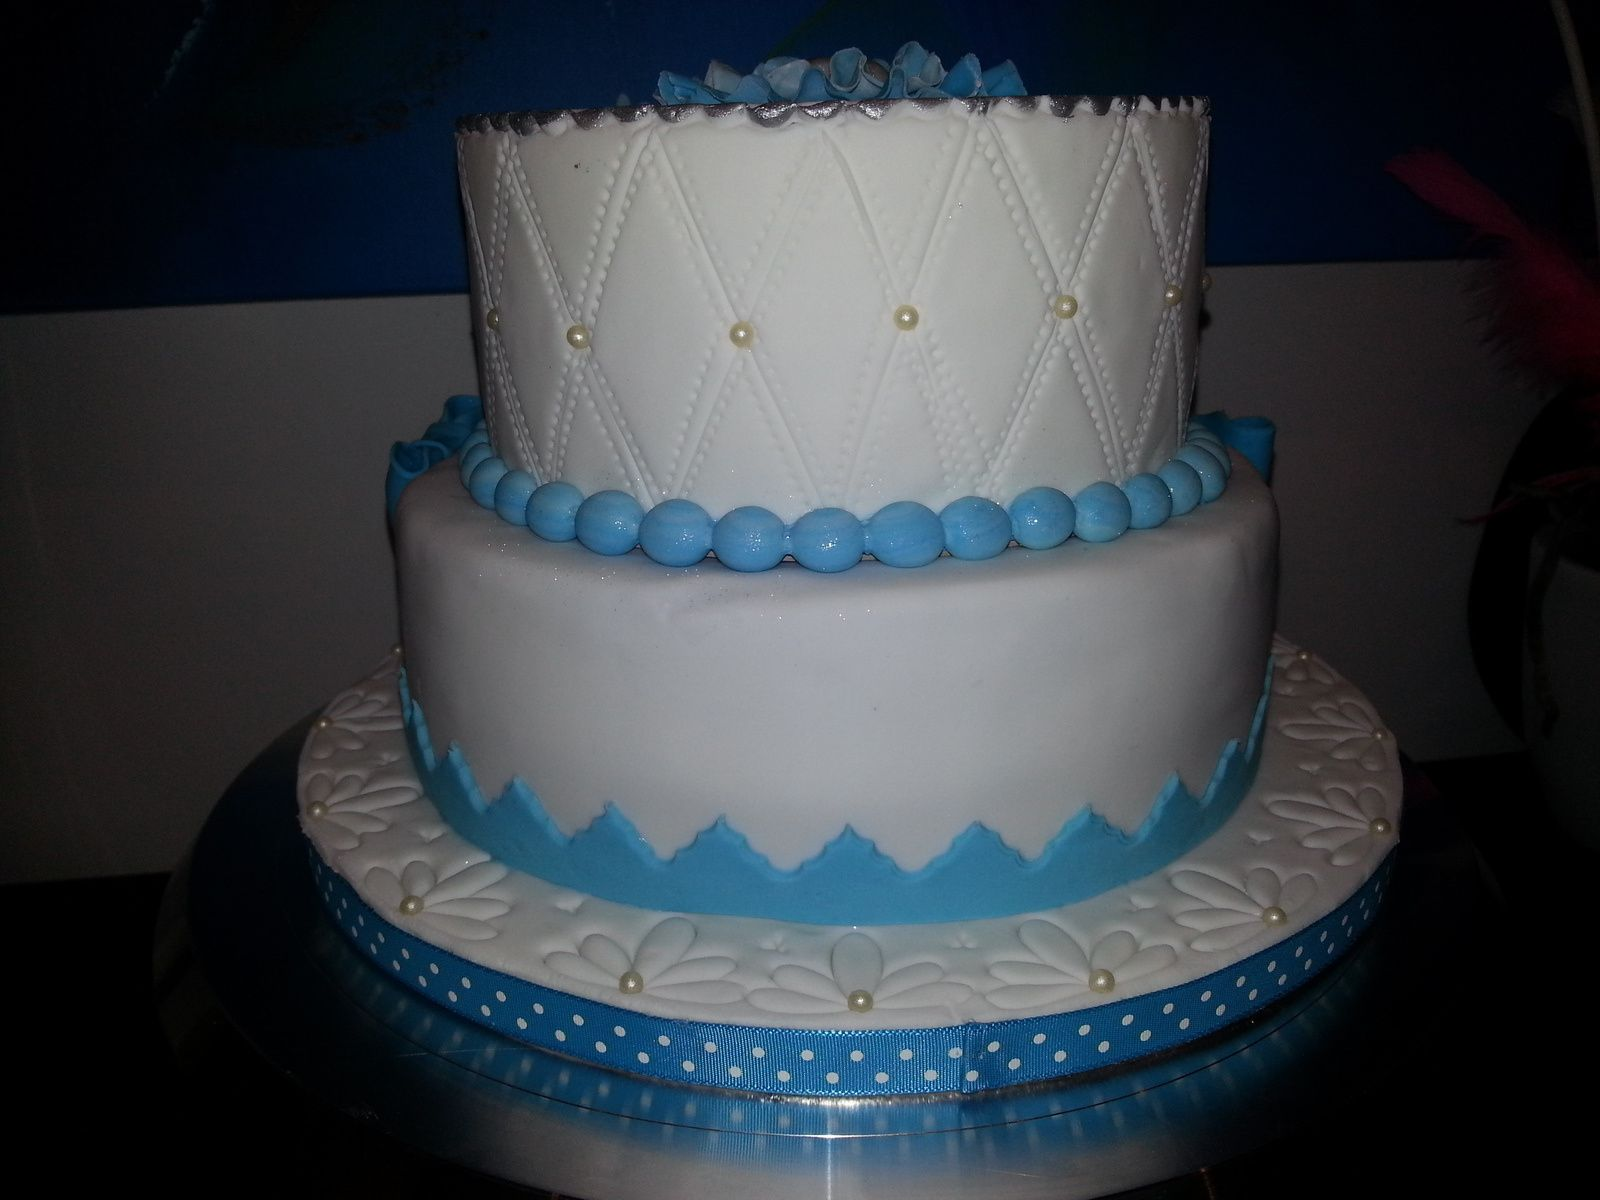 COURS DE CAKE DESIGN - AAcook